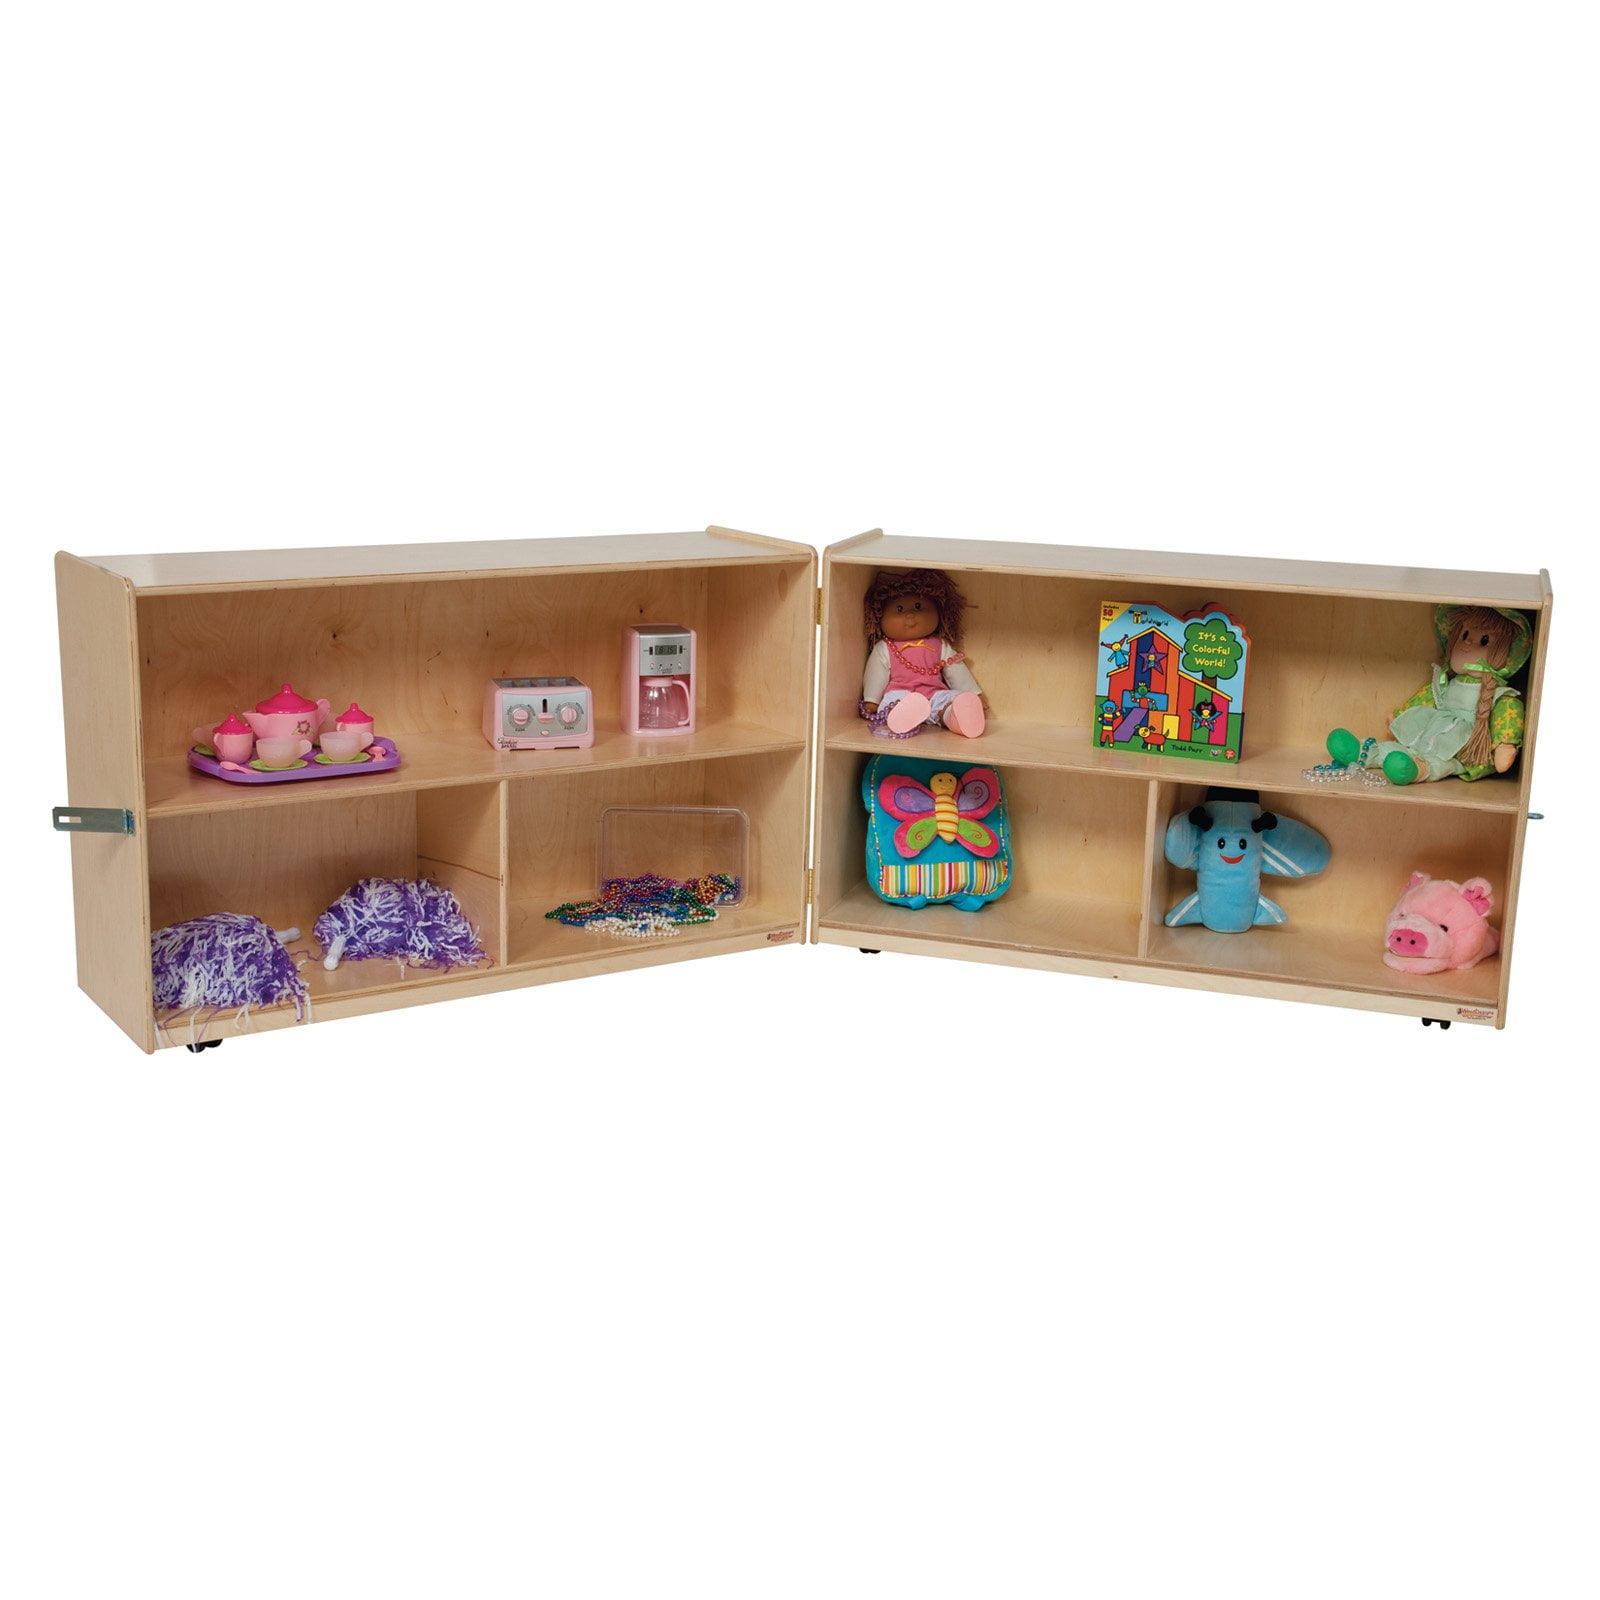 Wood Designs 30H in. Folding Versatile Storage Unit - Natural